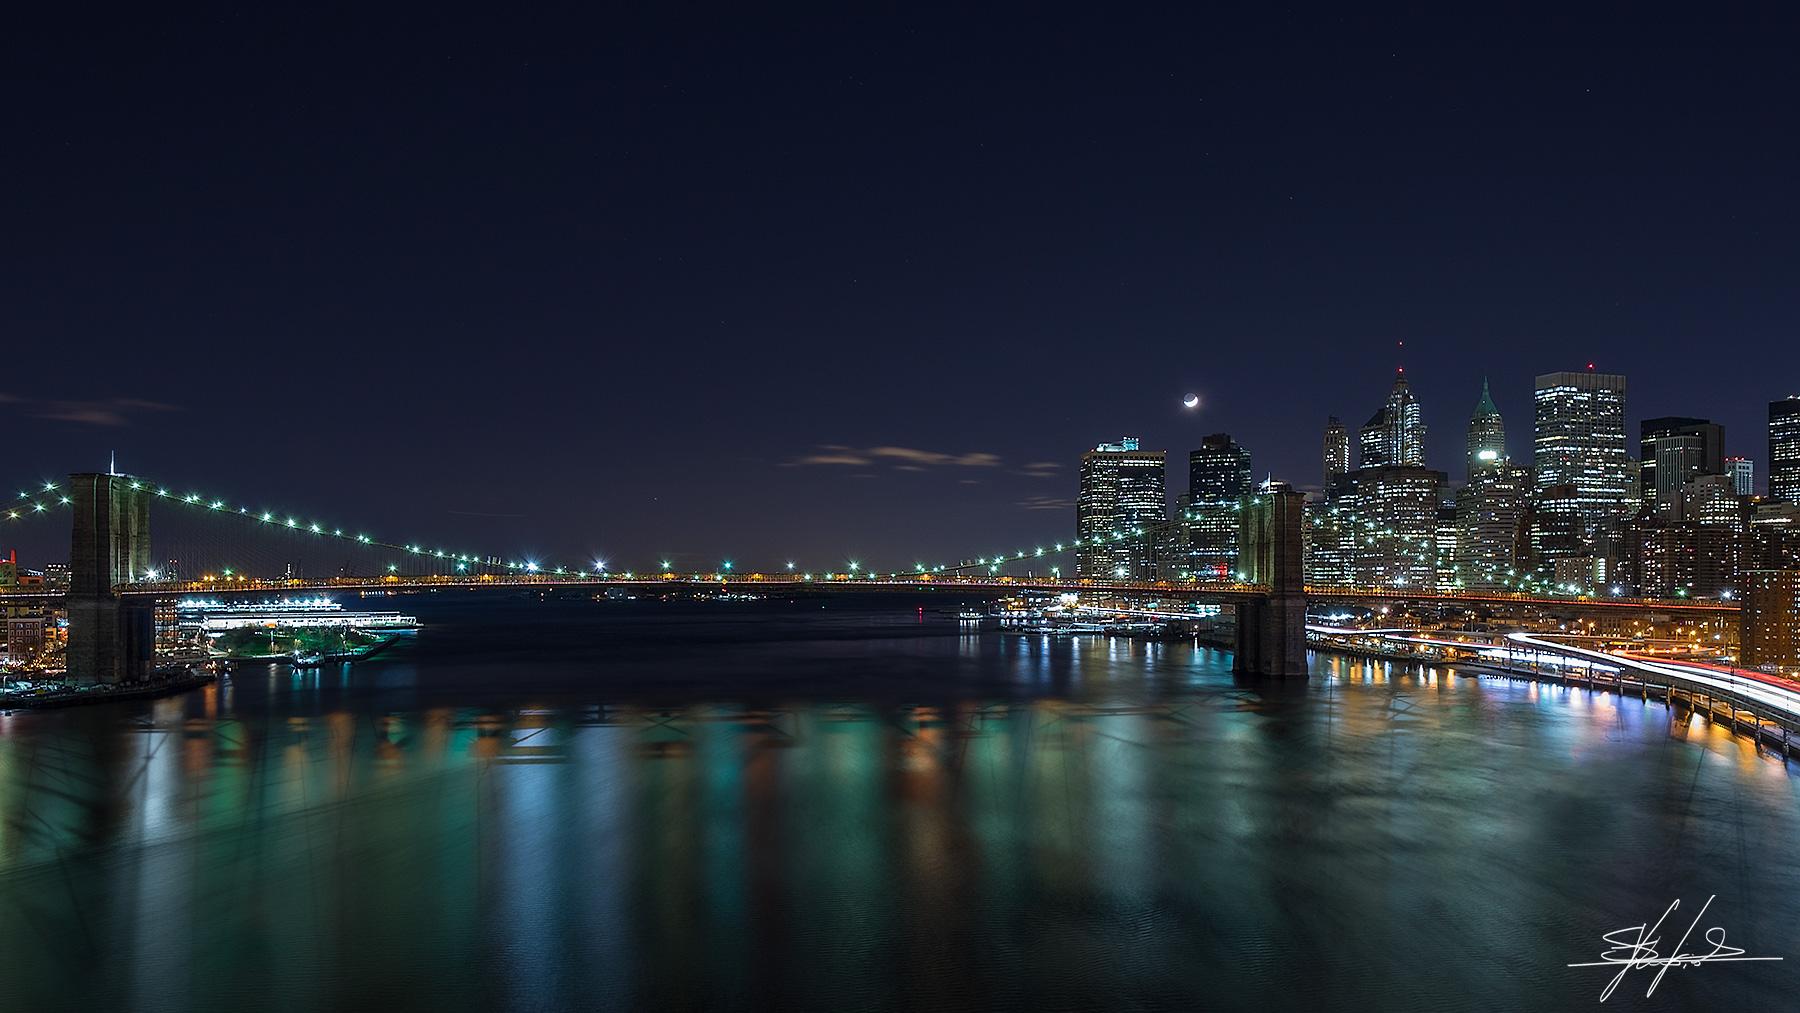 View from the Manhattan Bridge